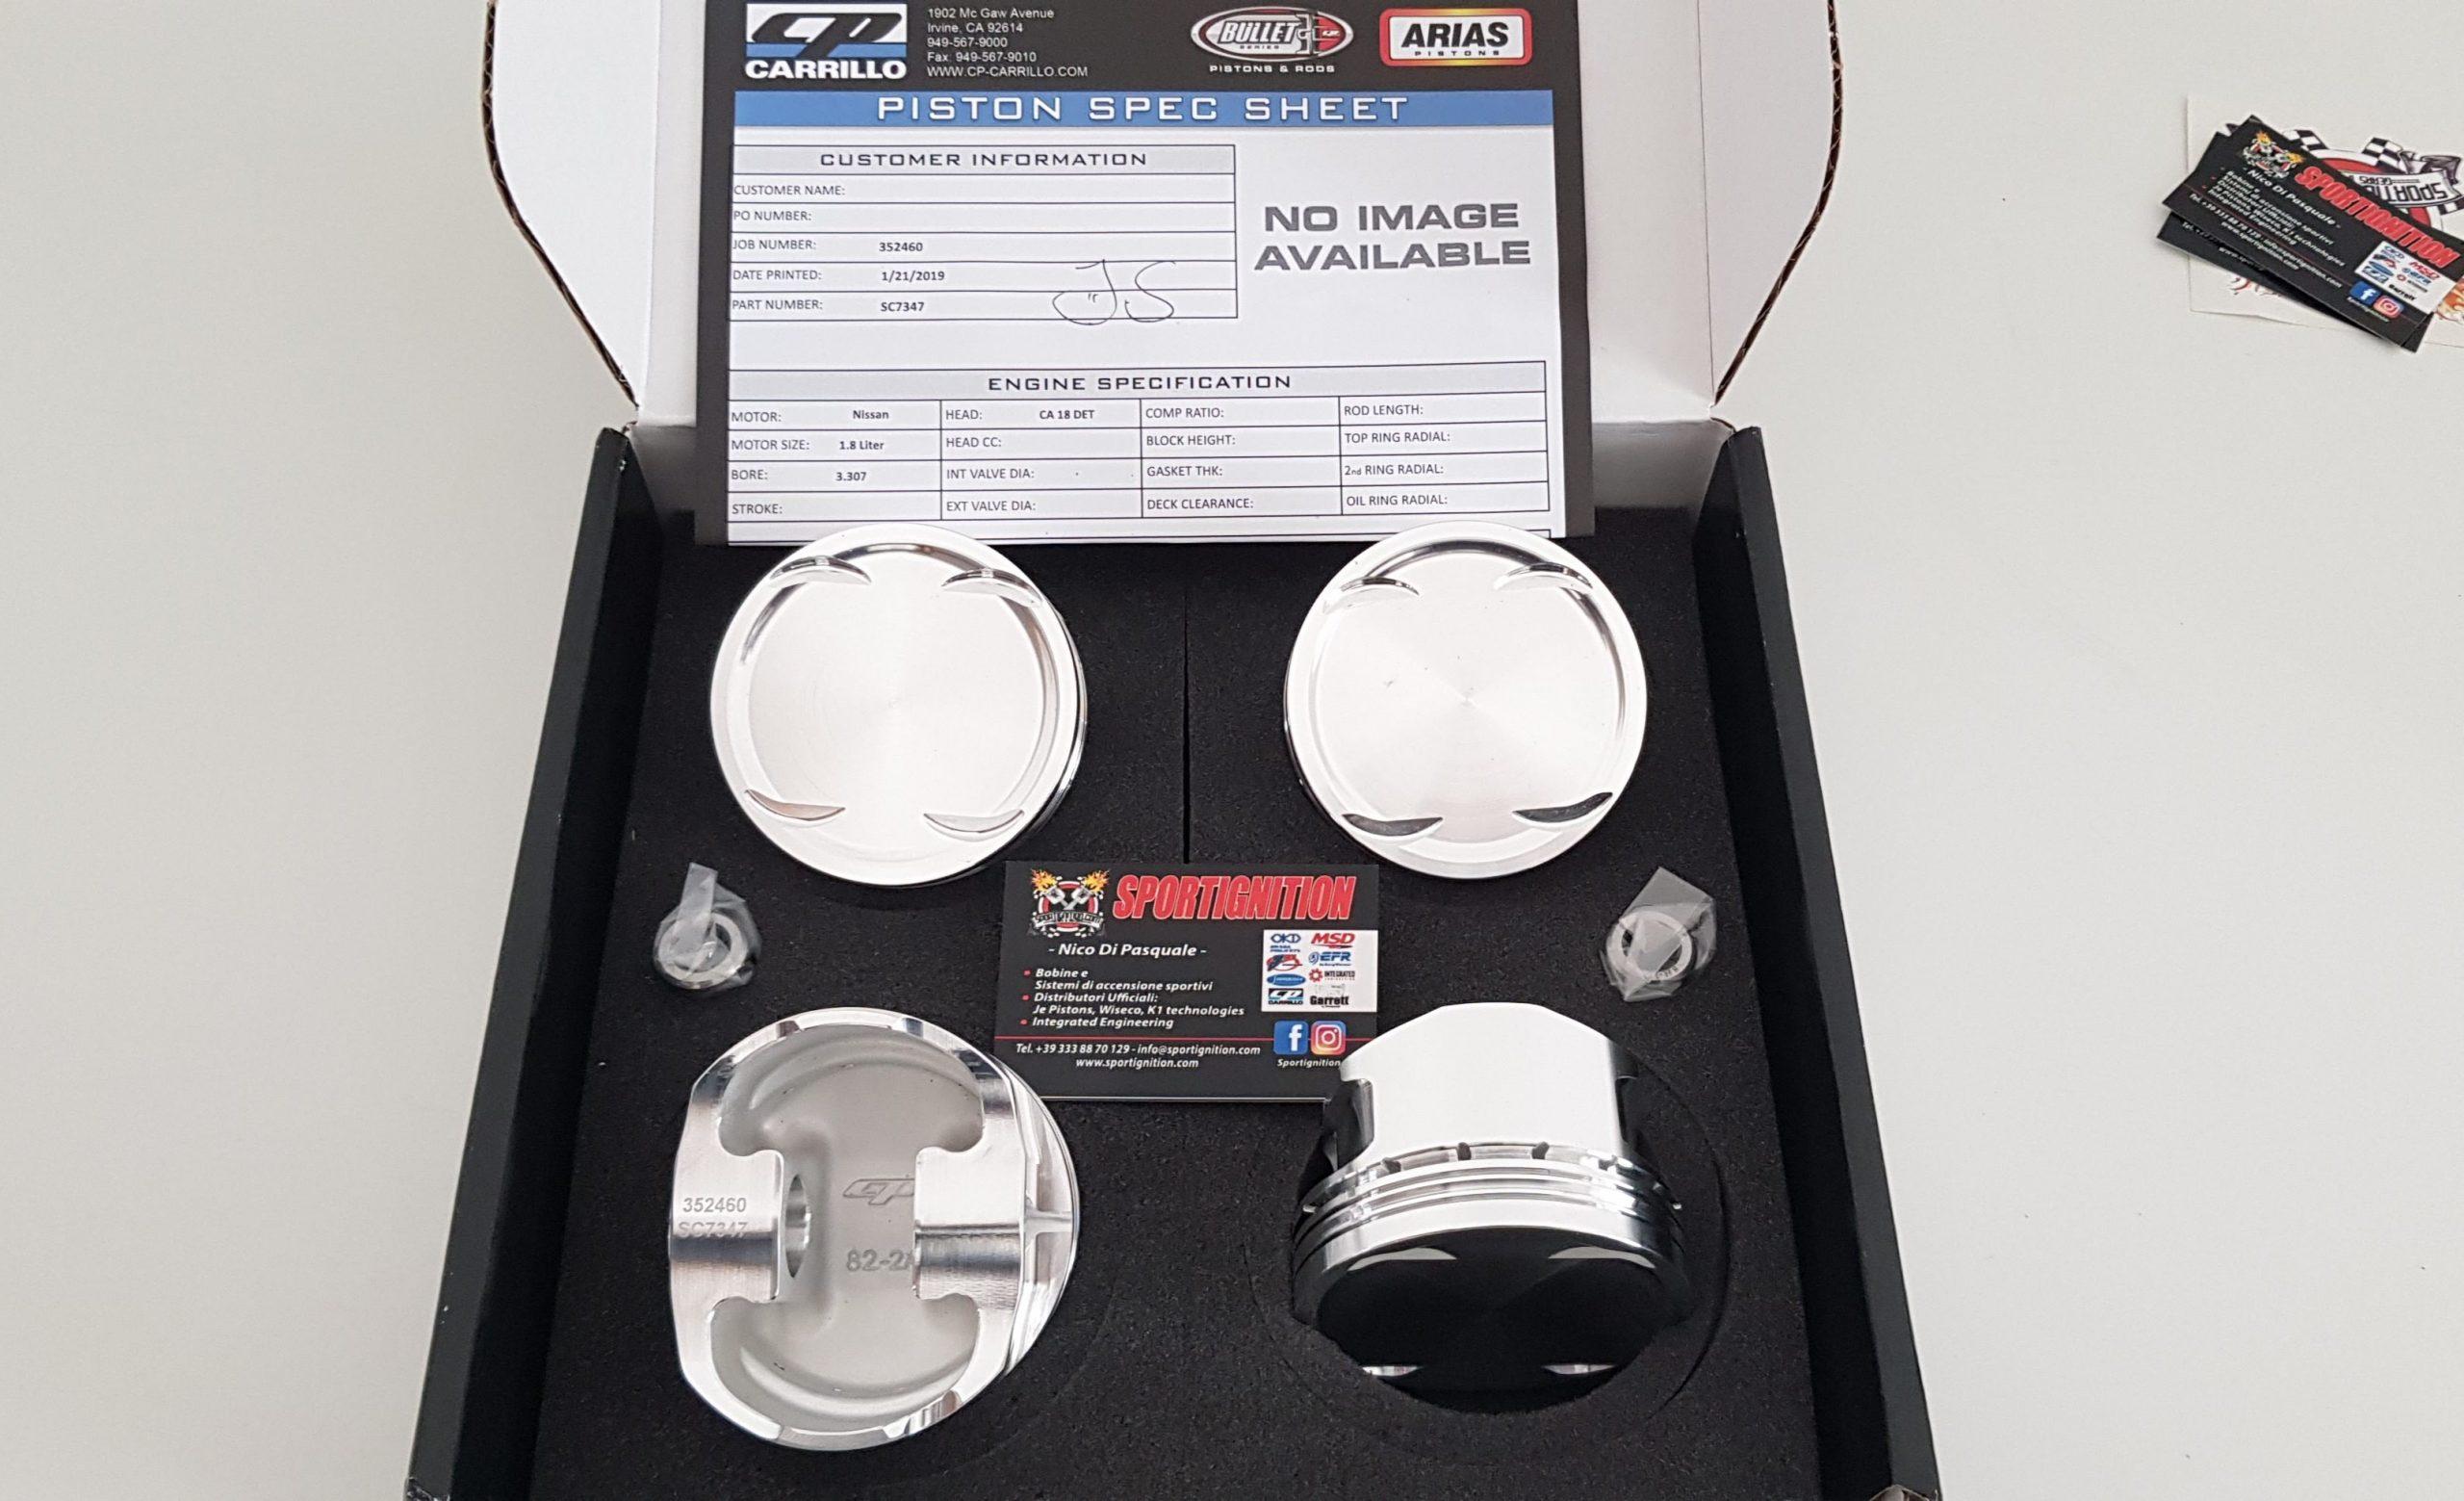 CP Carrillo Sc7347 Nissan Silvia S13 C18det +1mm oversize 8.5.1